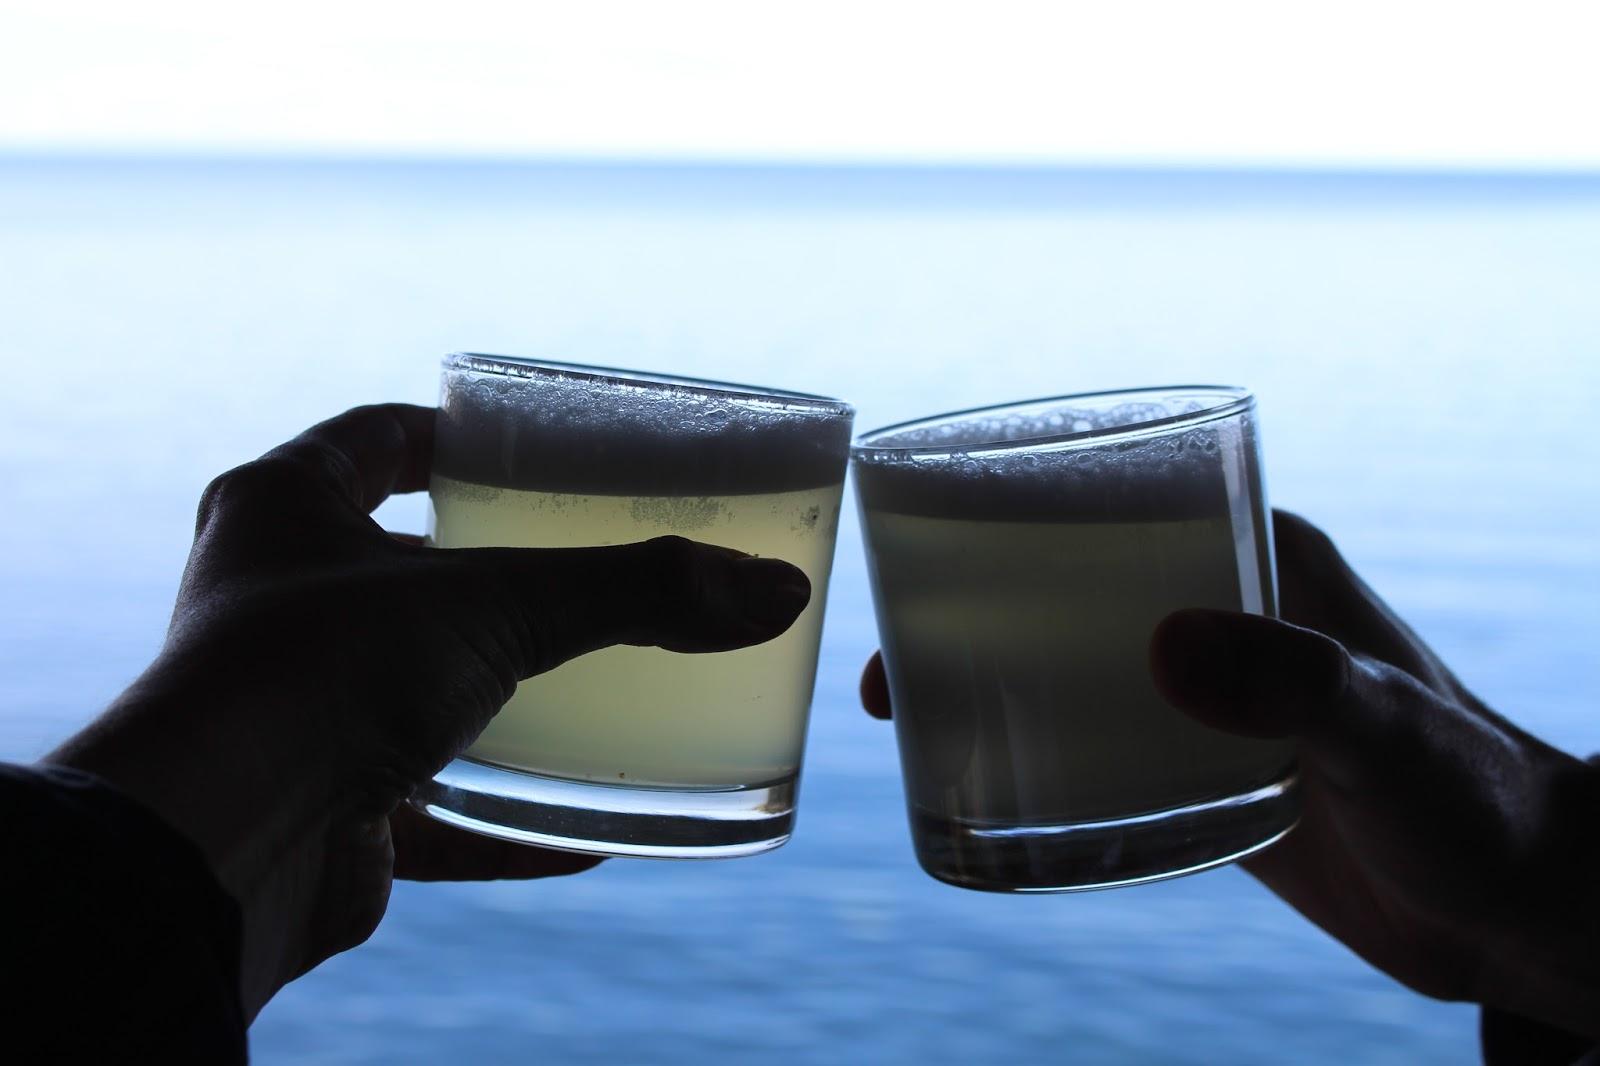 Pisco sours at Amantica Lodge, Lake Titicaca, Peru - South America travel blog